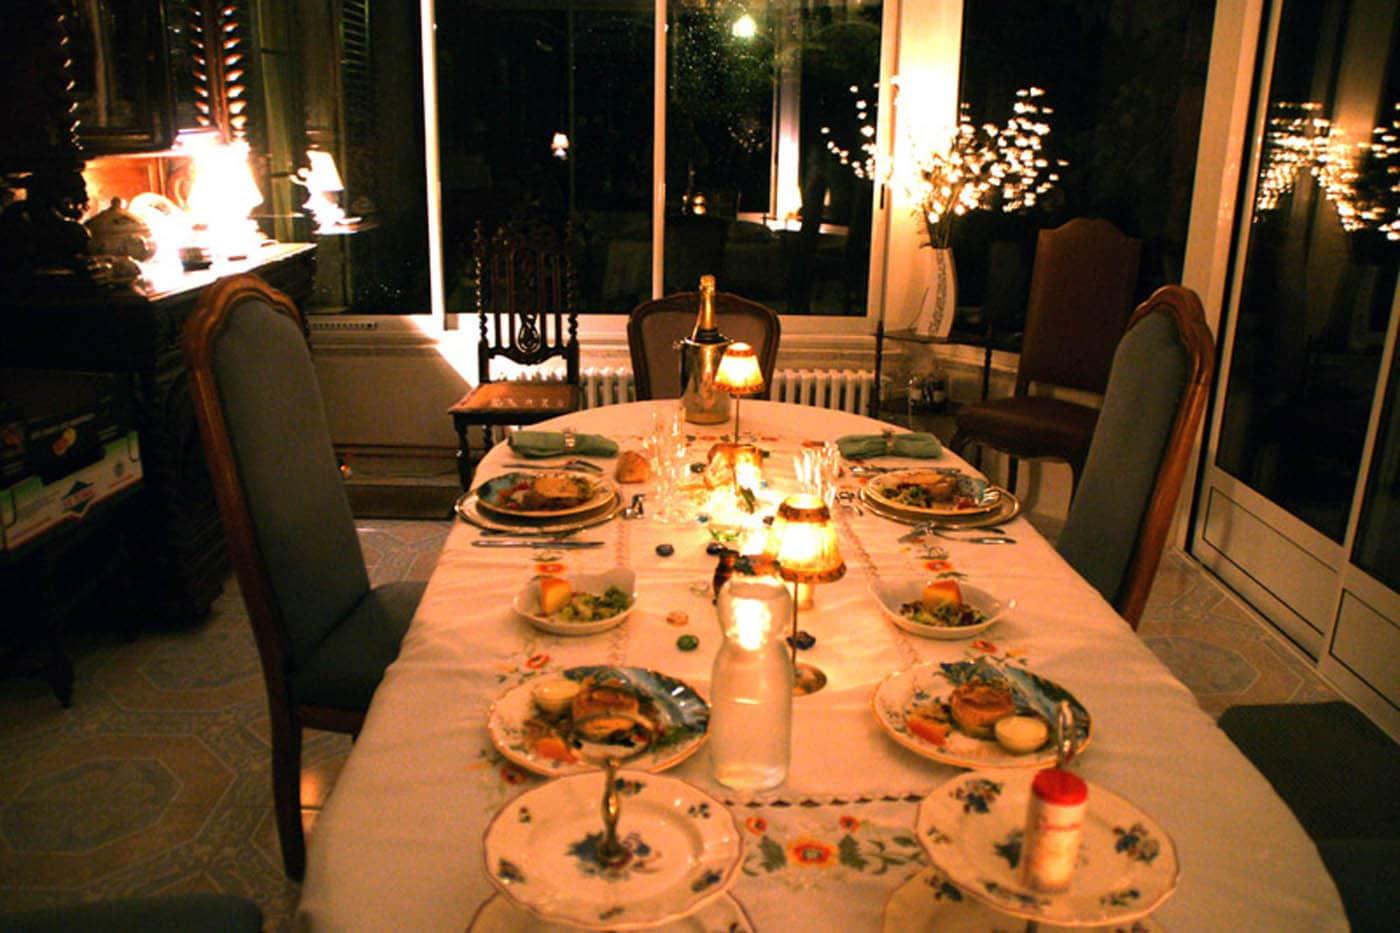 soiree romantique maison ventana blog. Black Bedroom Furniture Sets. Home Design Ideas